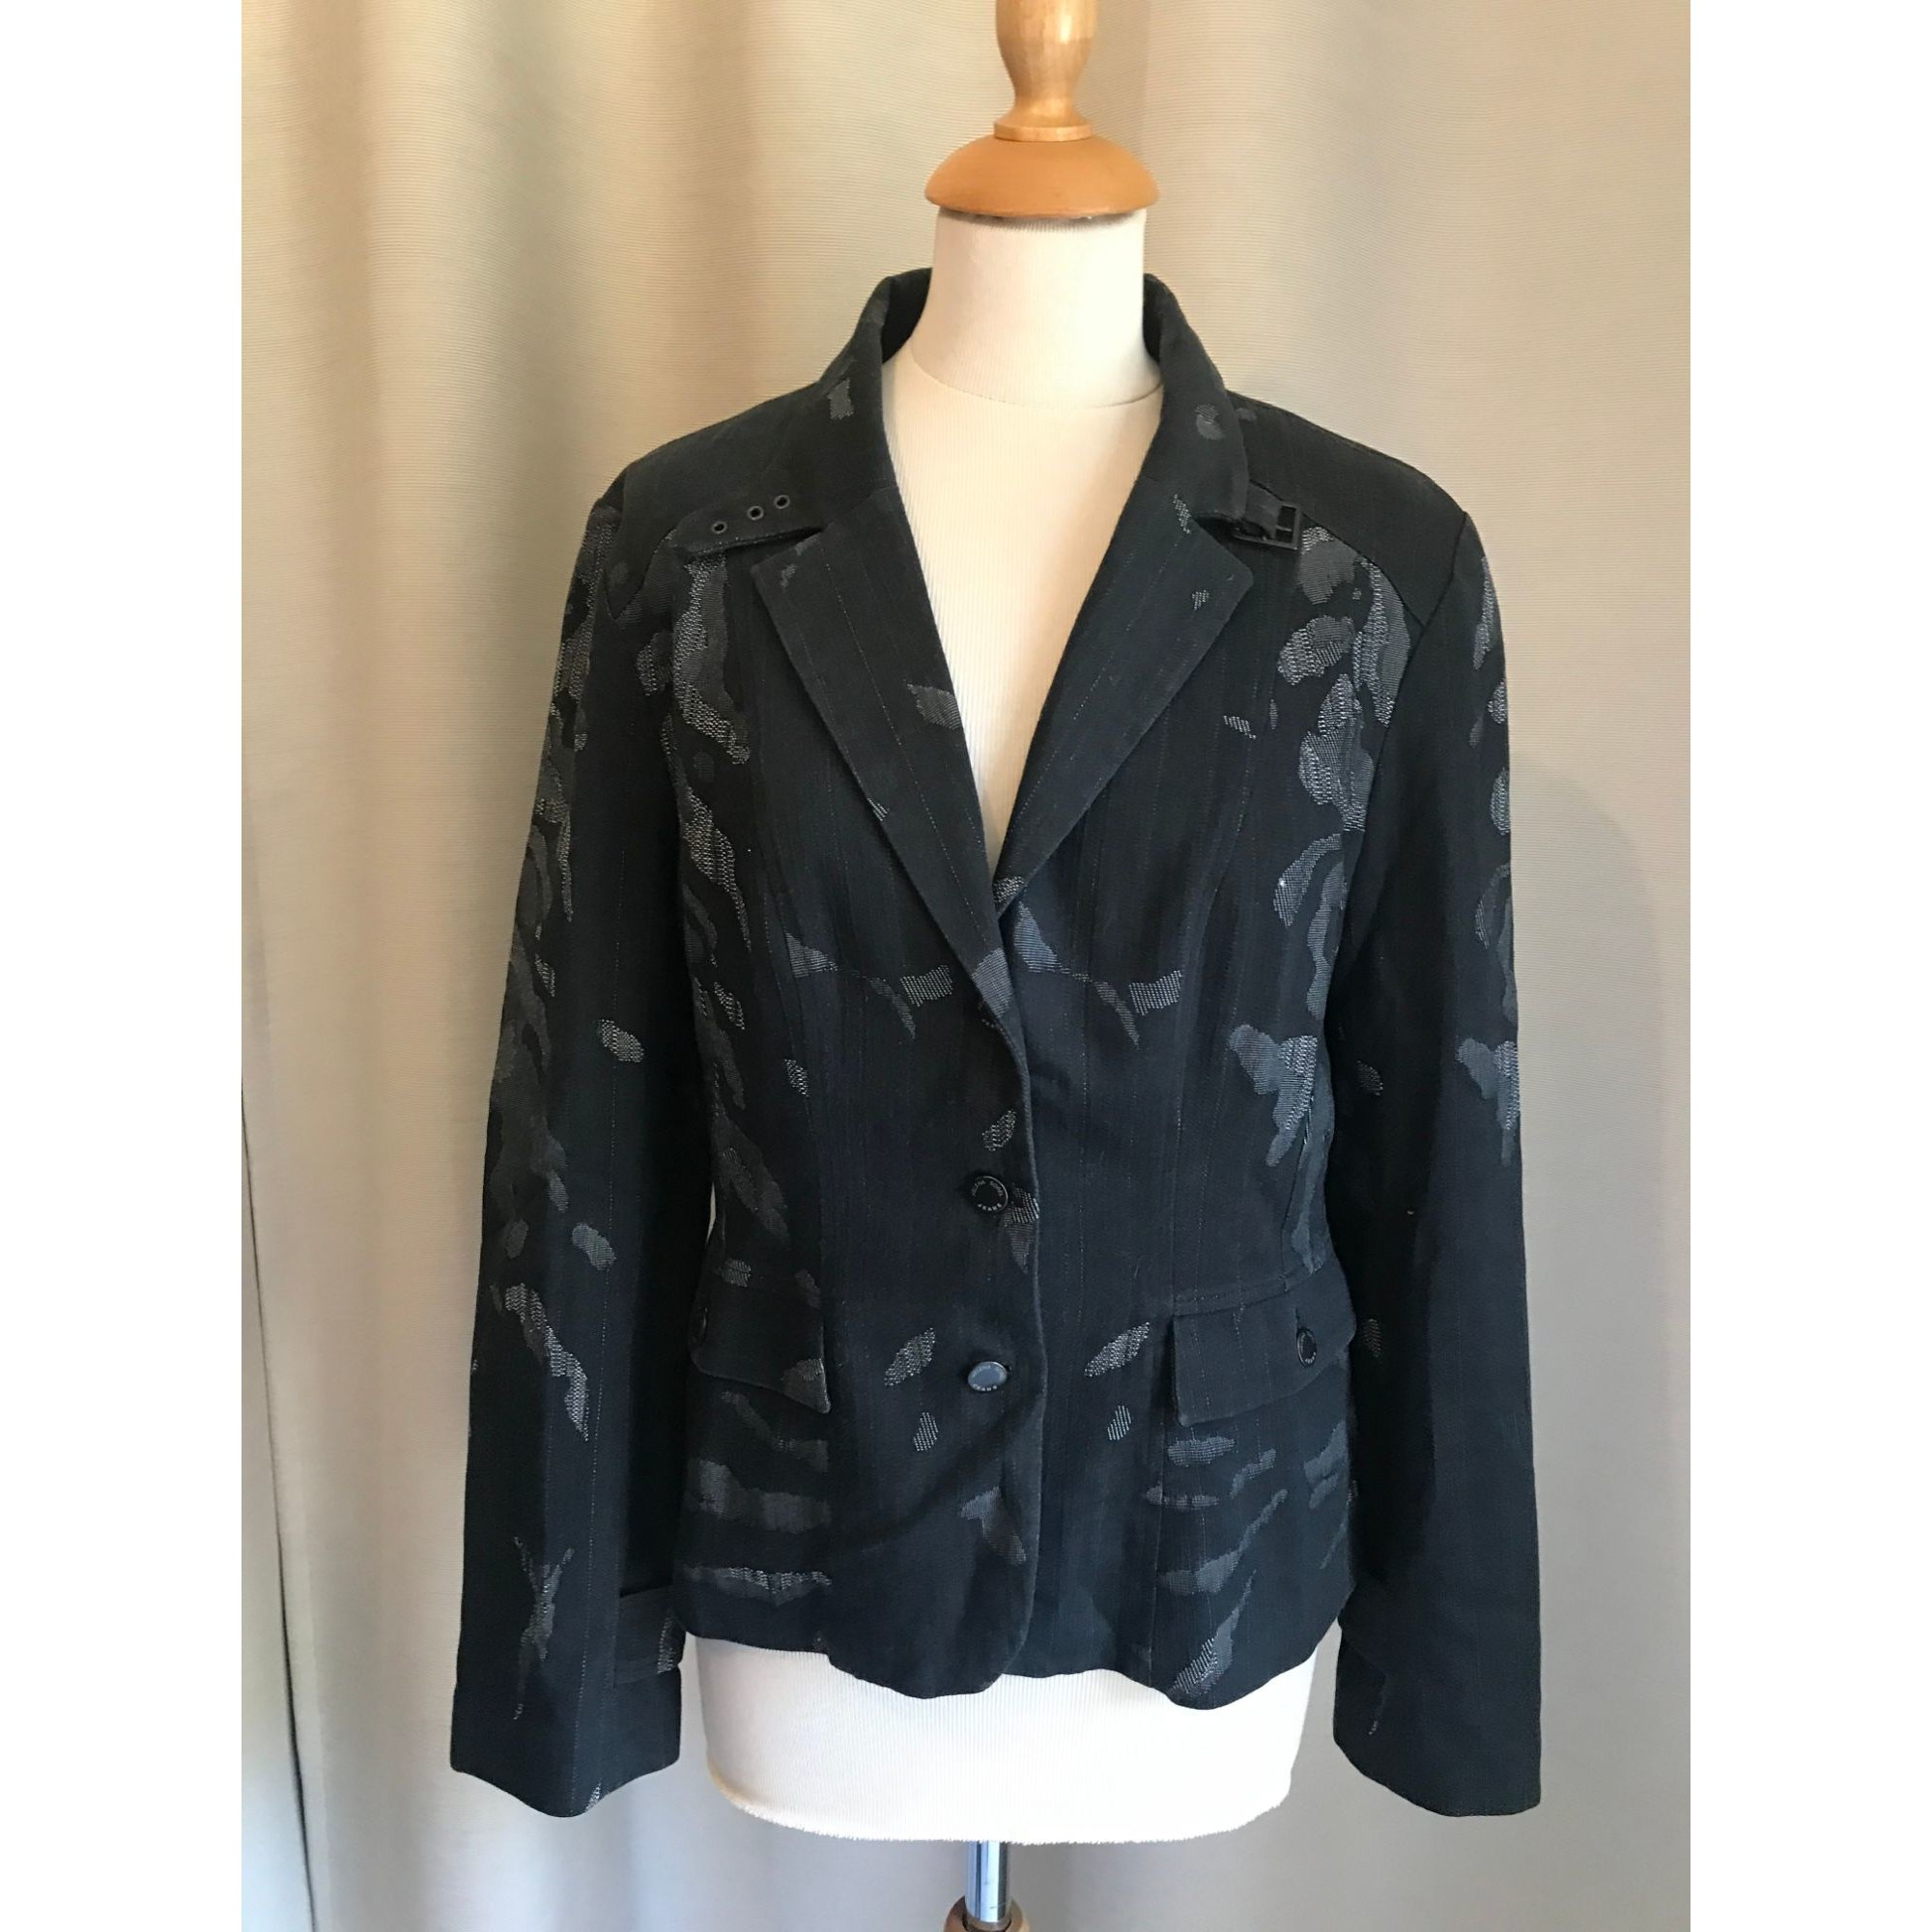 Blazer, veste tailleur HELENA SOREL Gris, anthracite